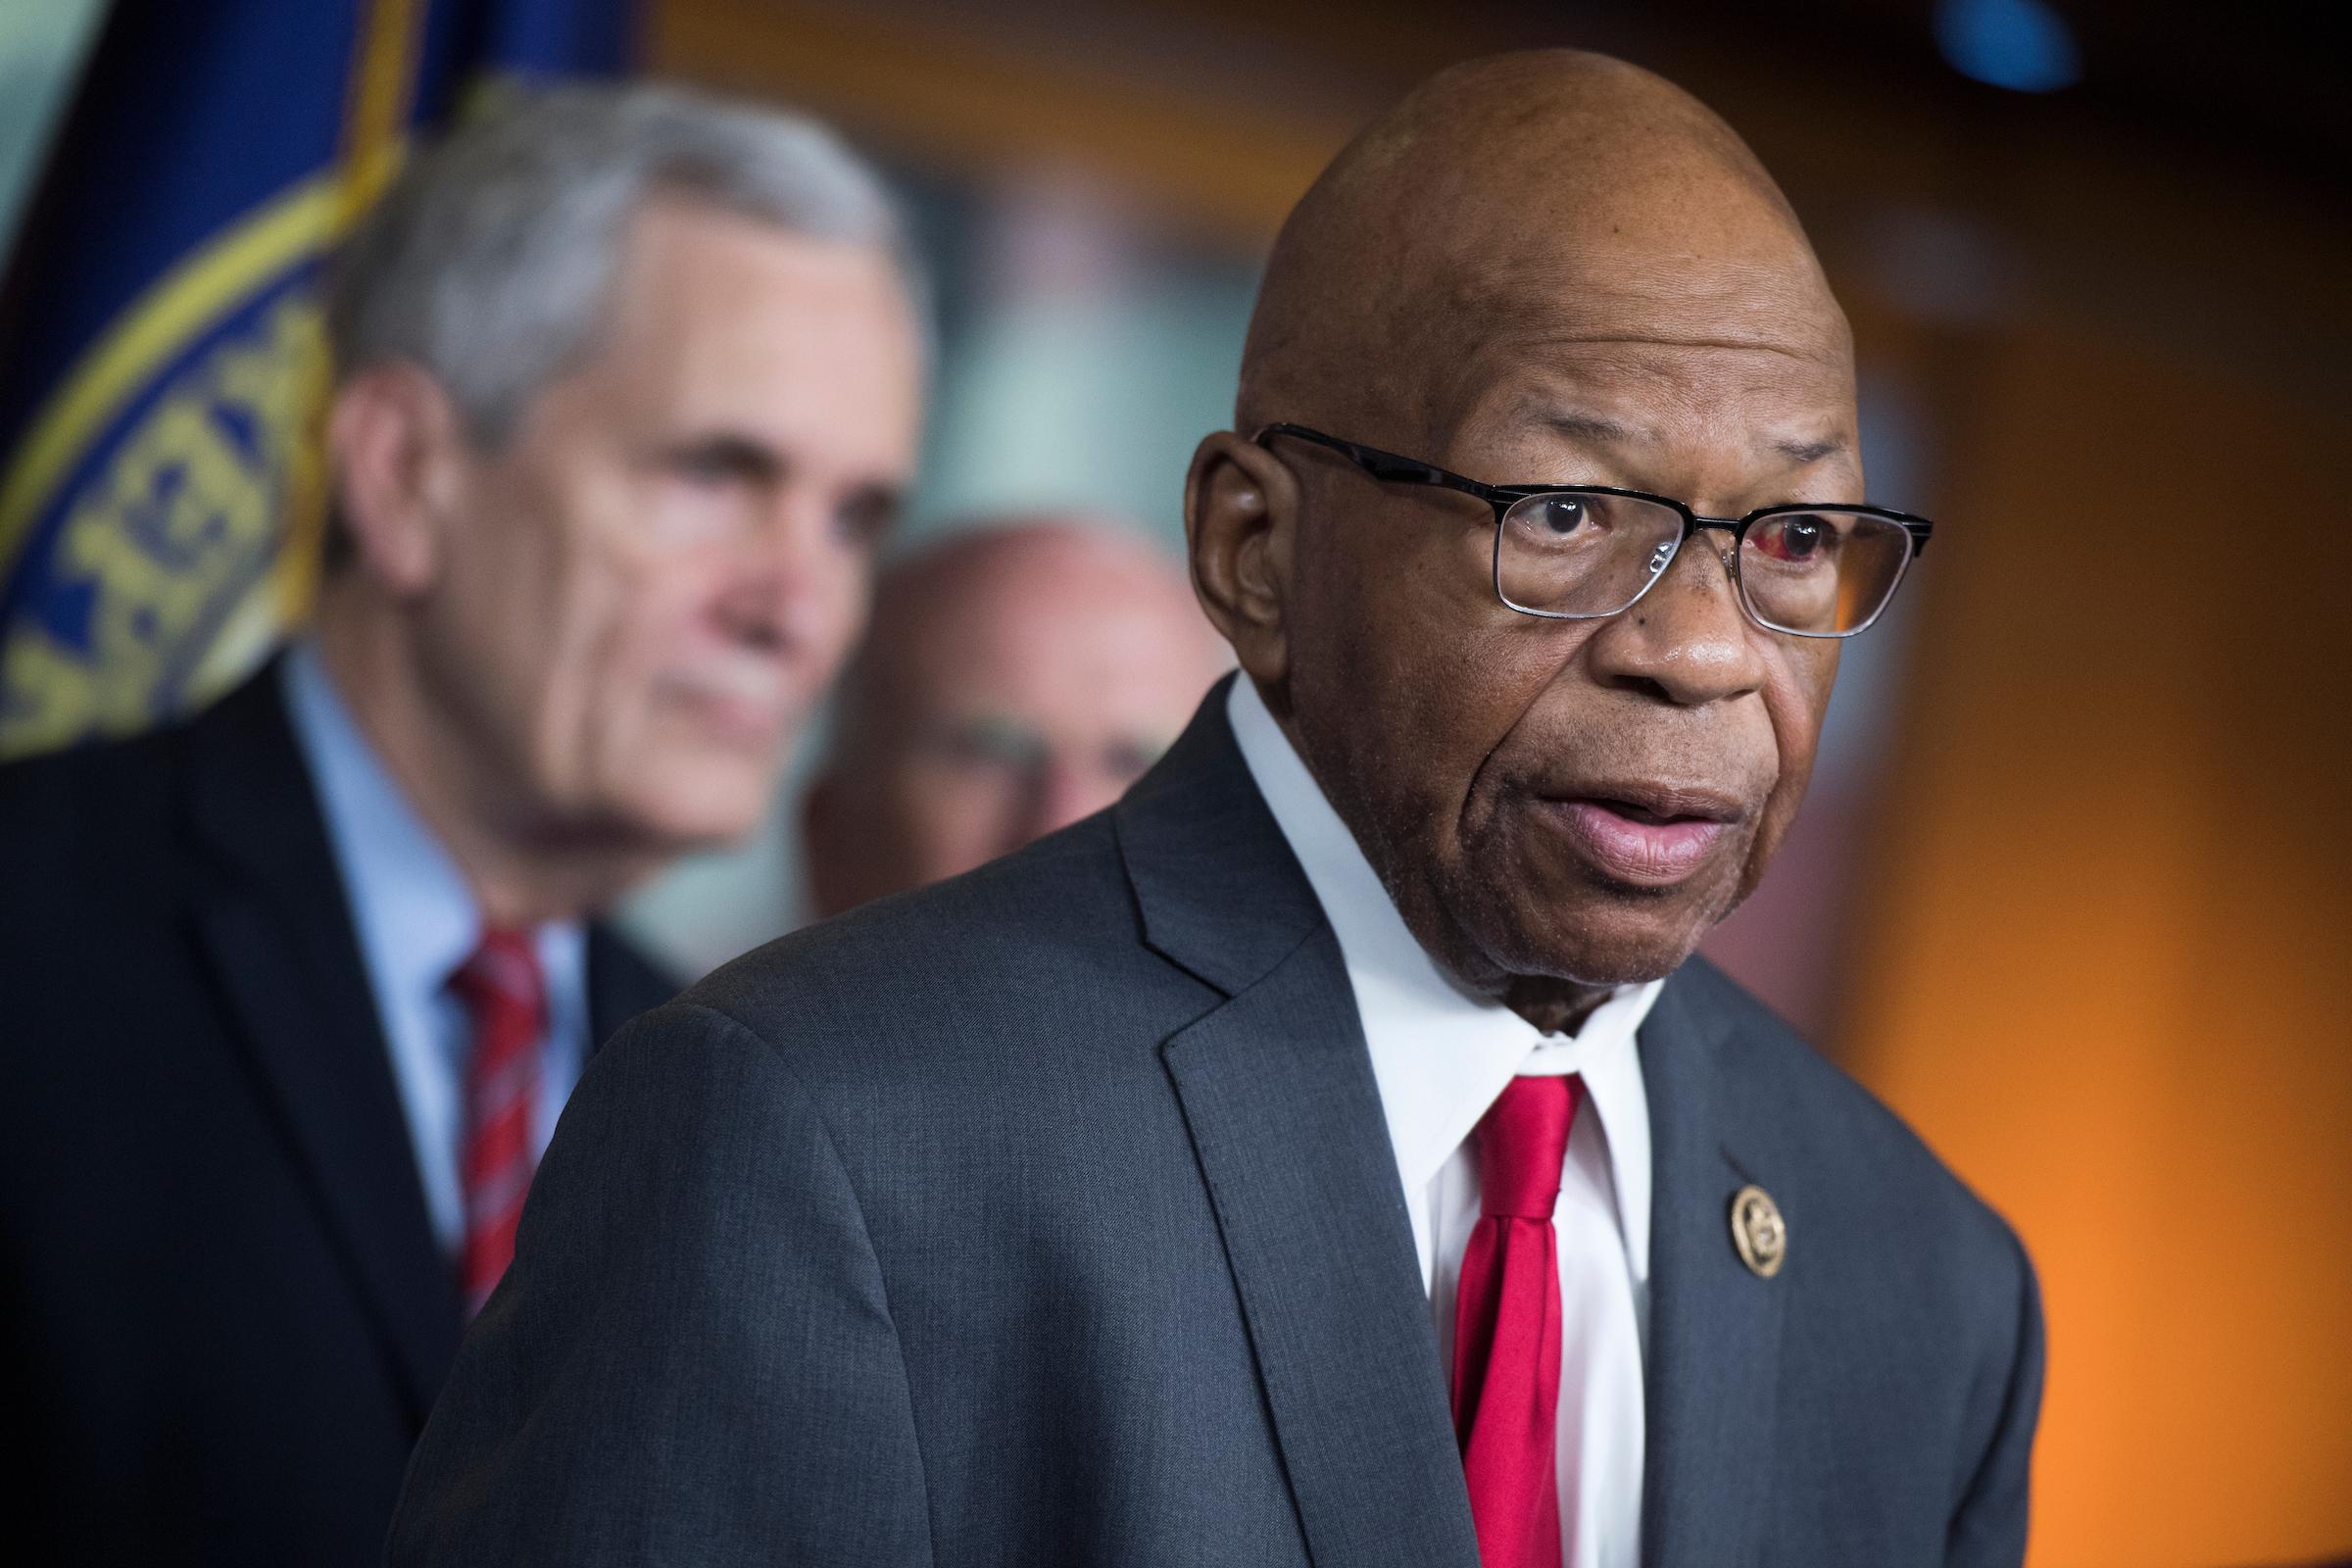 A bill introduced by Rep. Elijah E. Cummings uses HIV legislation as a model.(Photo By Tom Williams/CQ Roll Call)